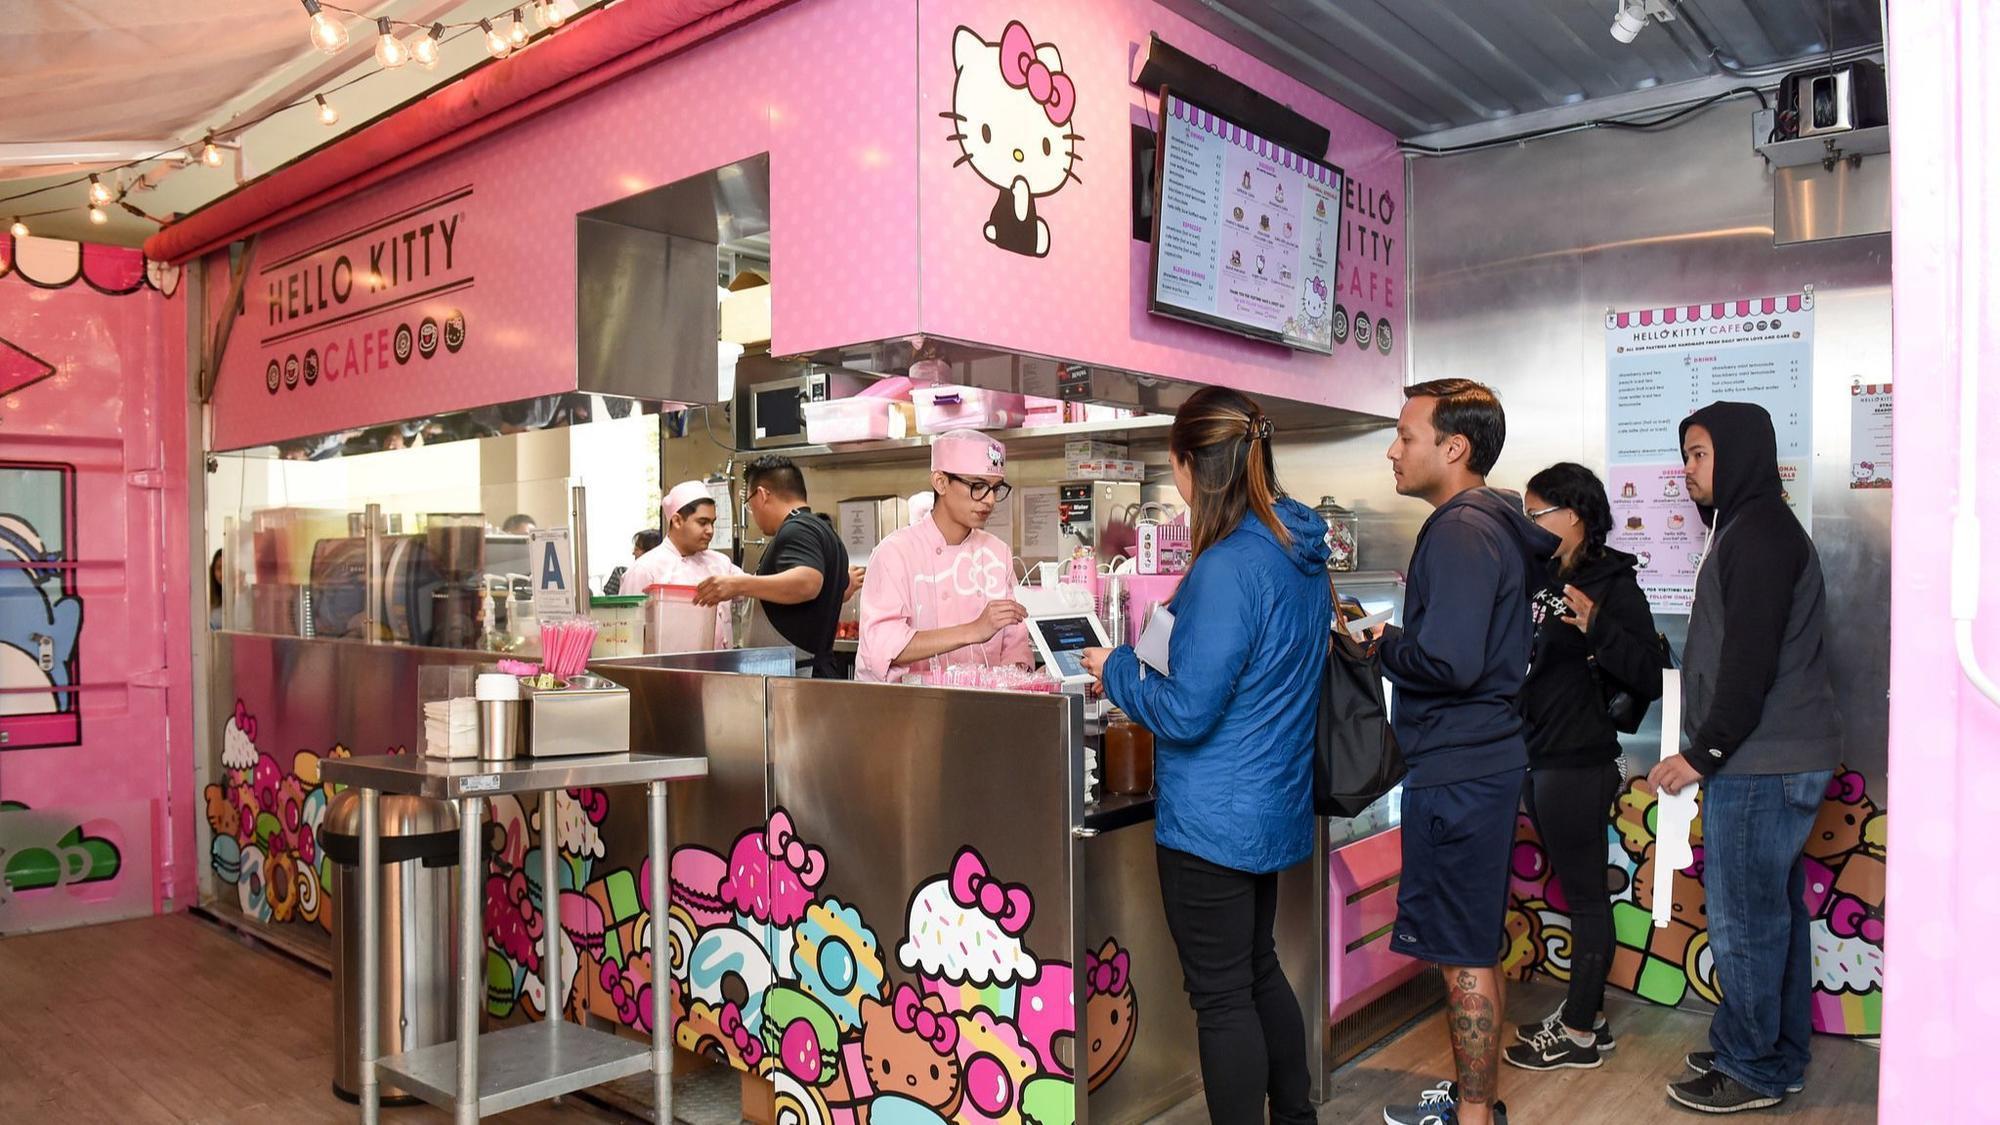 Mission Valley Cafe San Diego Menu